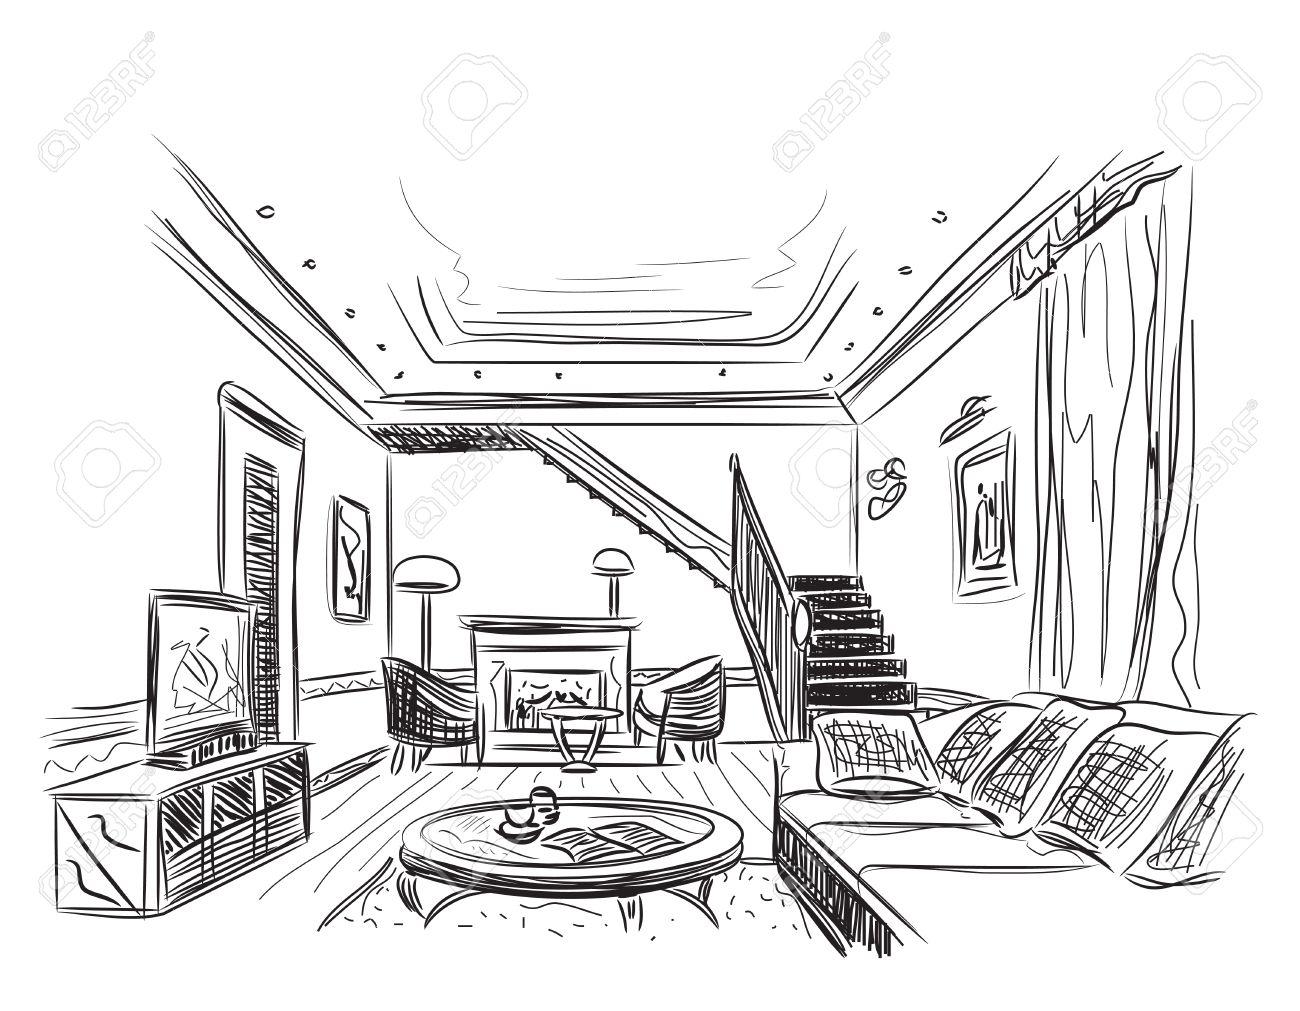 Modern interior room sketch. Hand drawn illustration. - 49238303